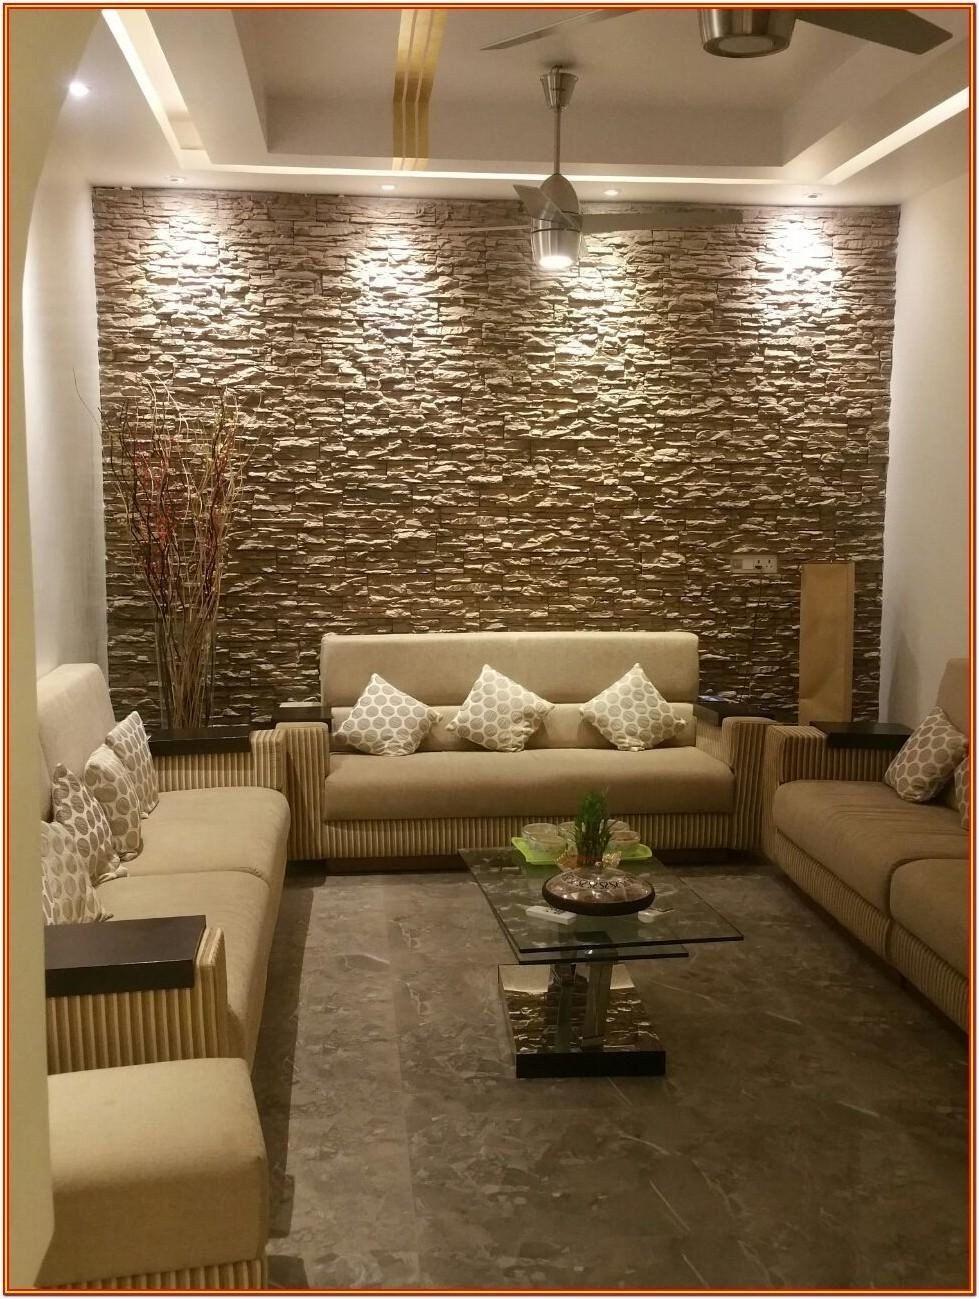 Living Room Wall Tiles Design Unique Decorative Wall Tiles Living Room India By Lori In 2020 Stone Wall Interior Design Interior Wall Design Living Room Design Modern